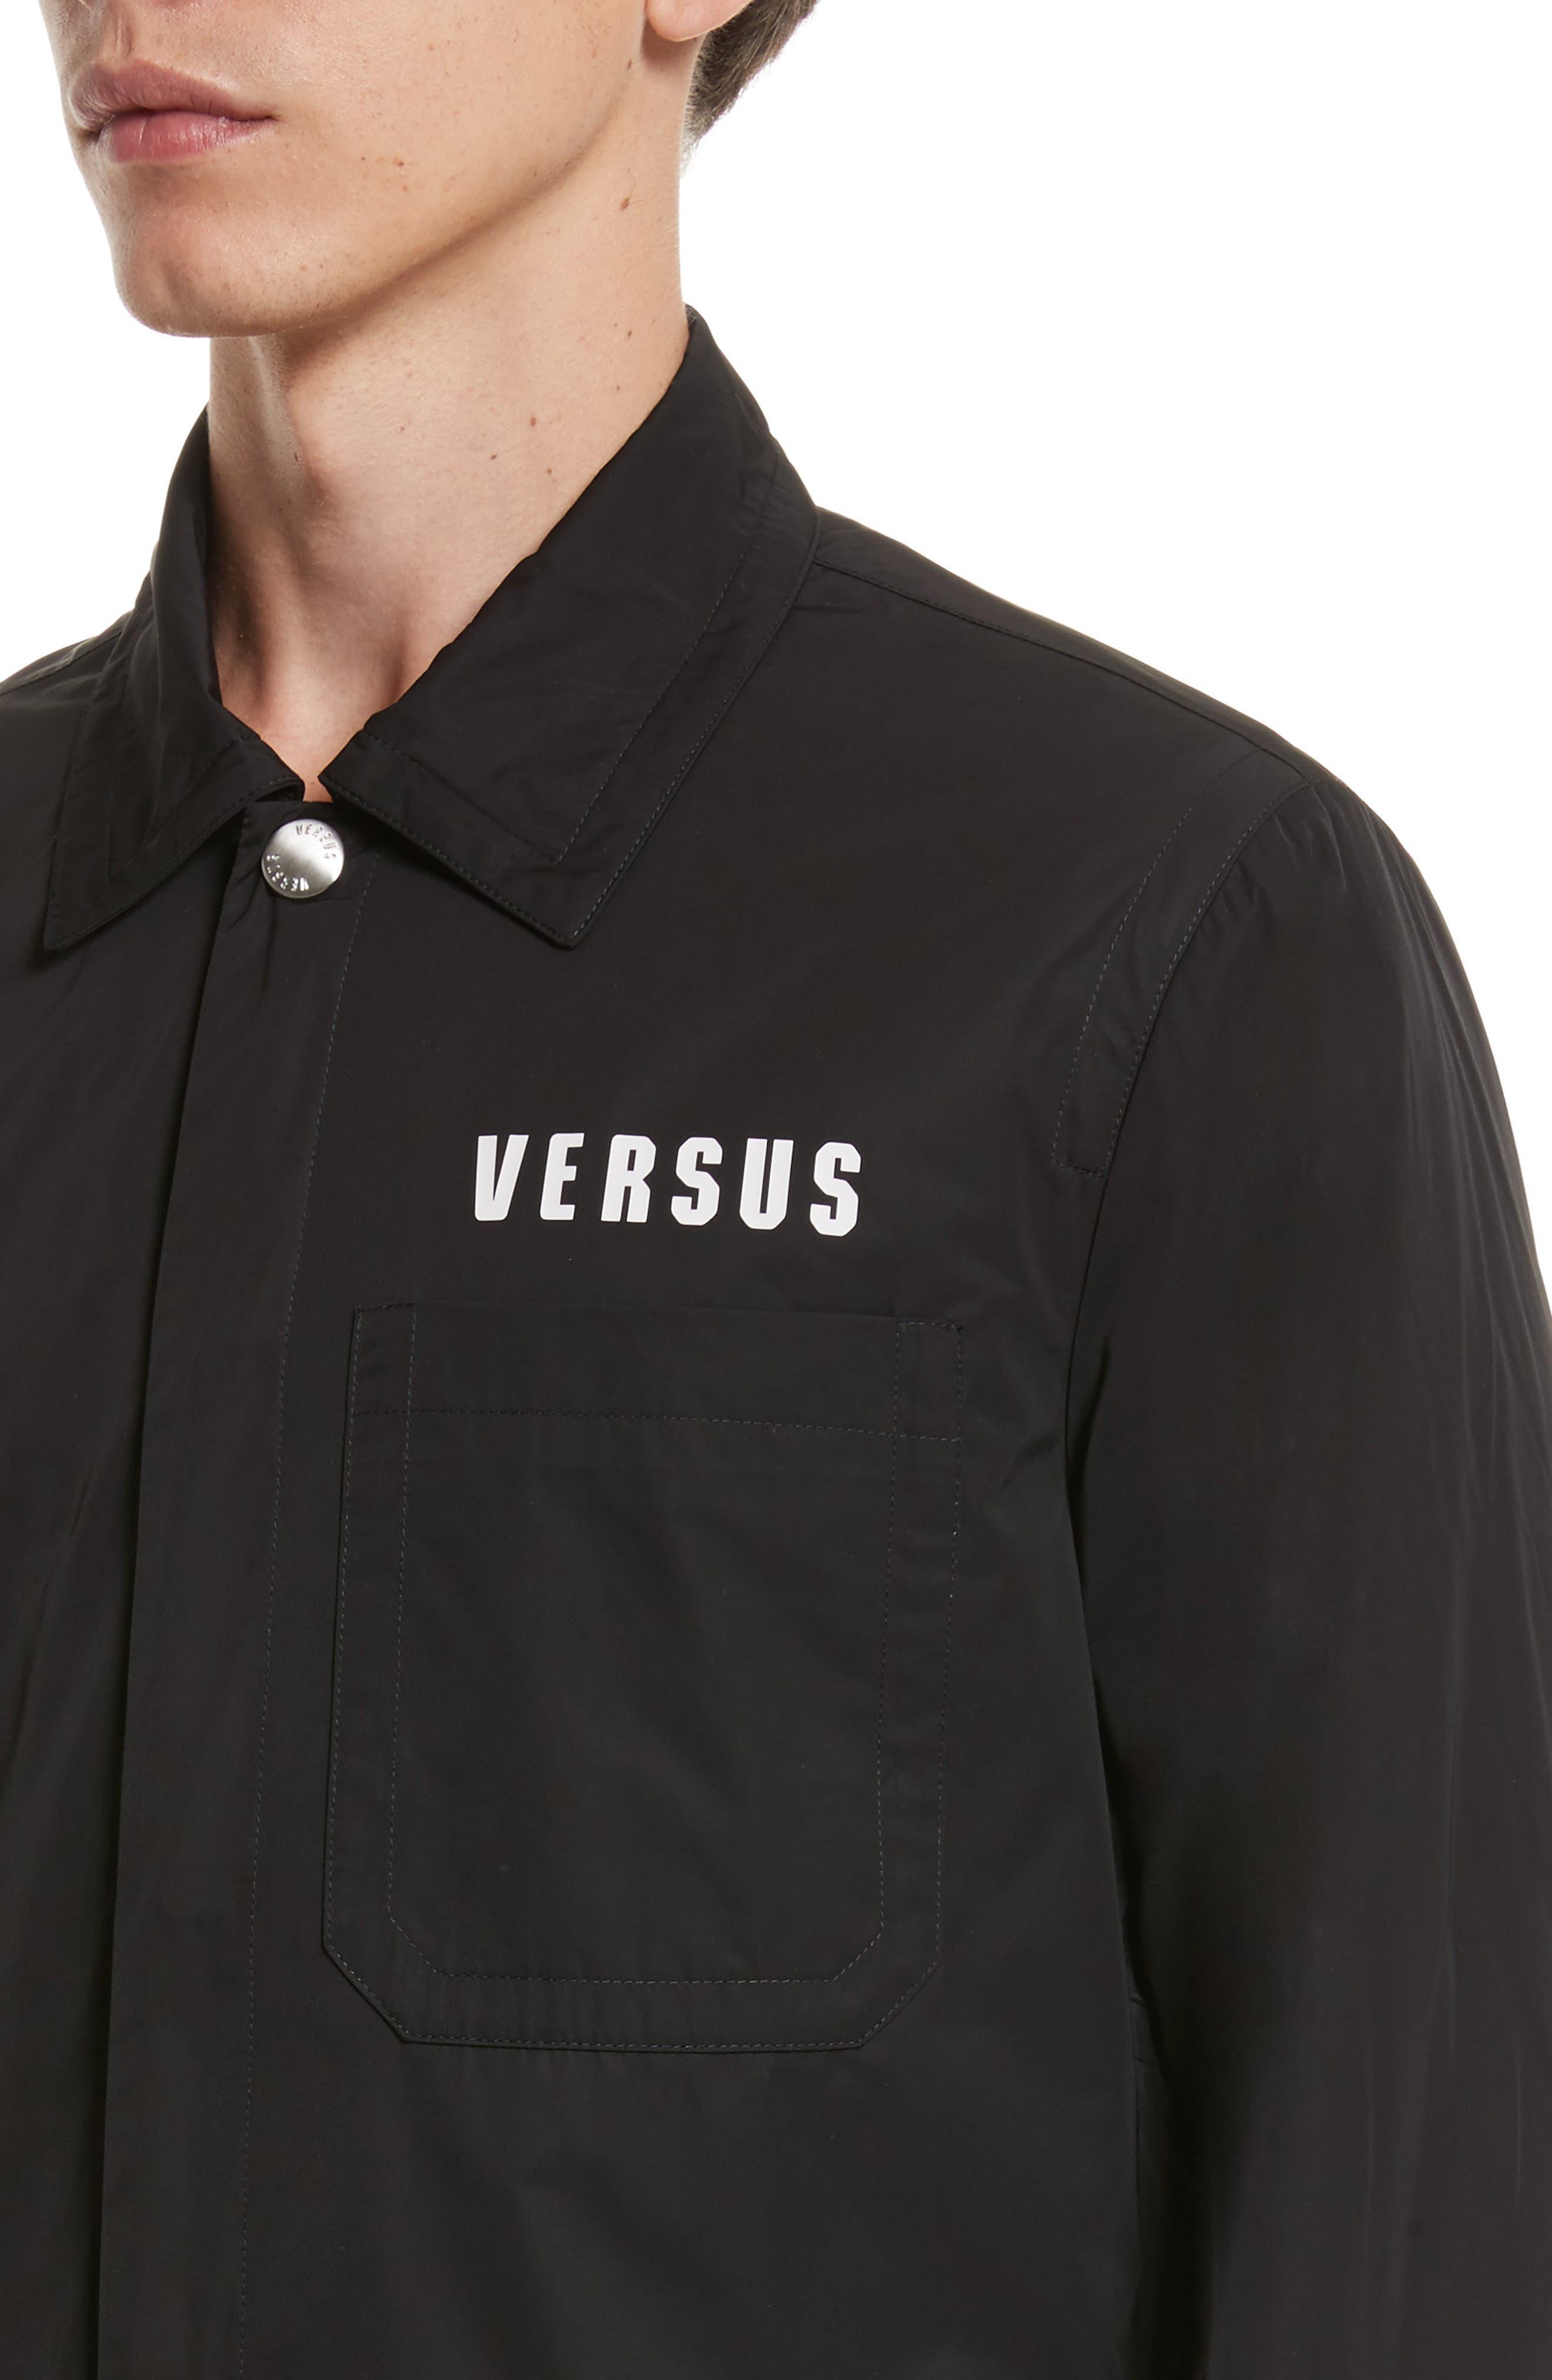 VERSUS by Versace Tech Jacket,                             Alternate thumbnail 4, color,                             003